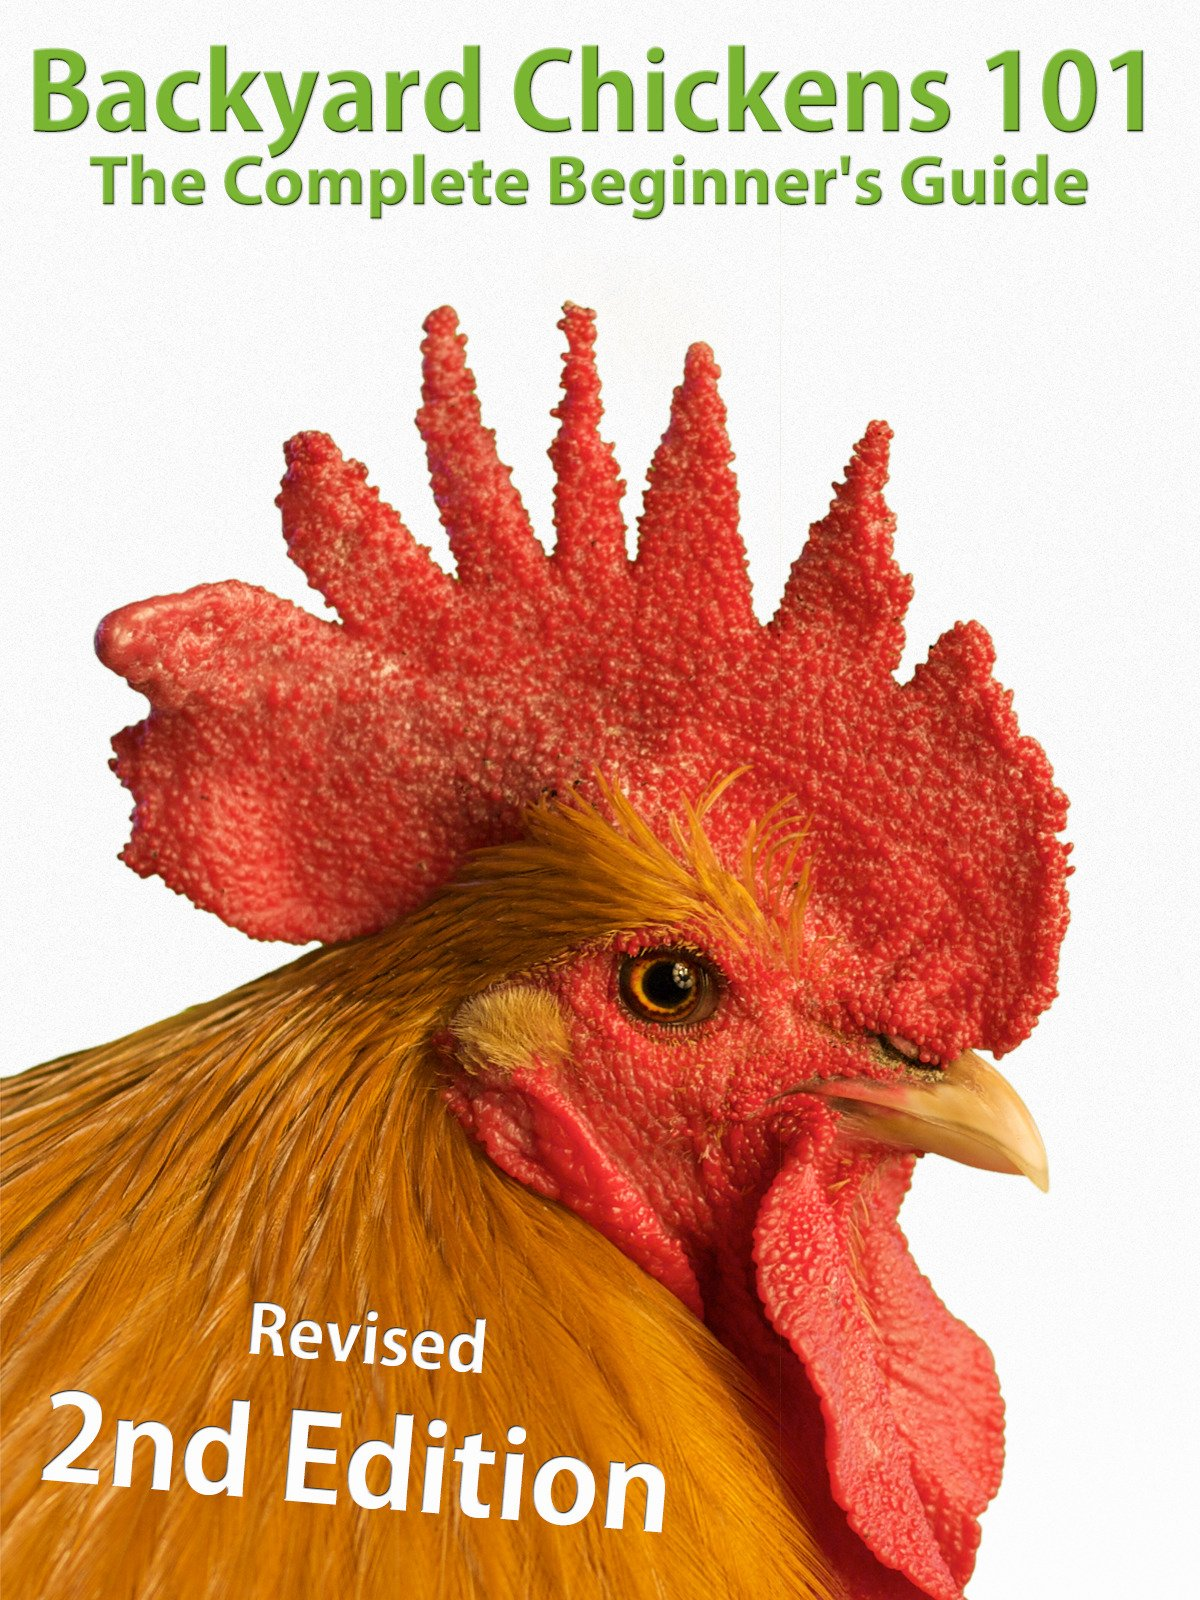 amazon com backyard chickens 101 the complete beginner u0027s guide